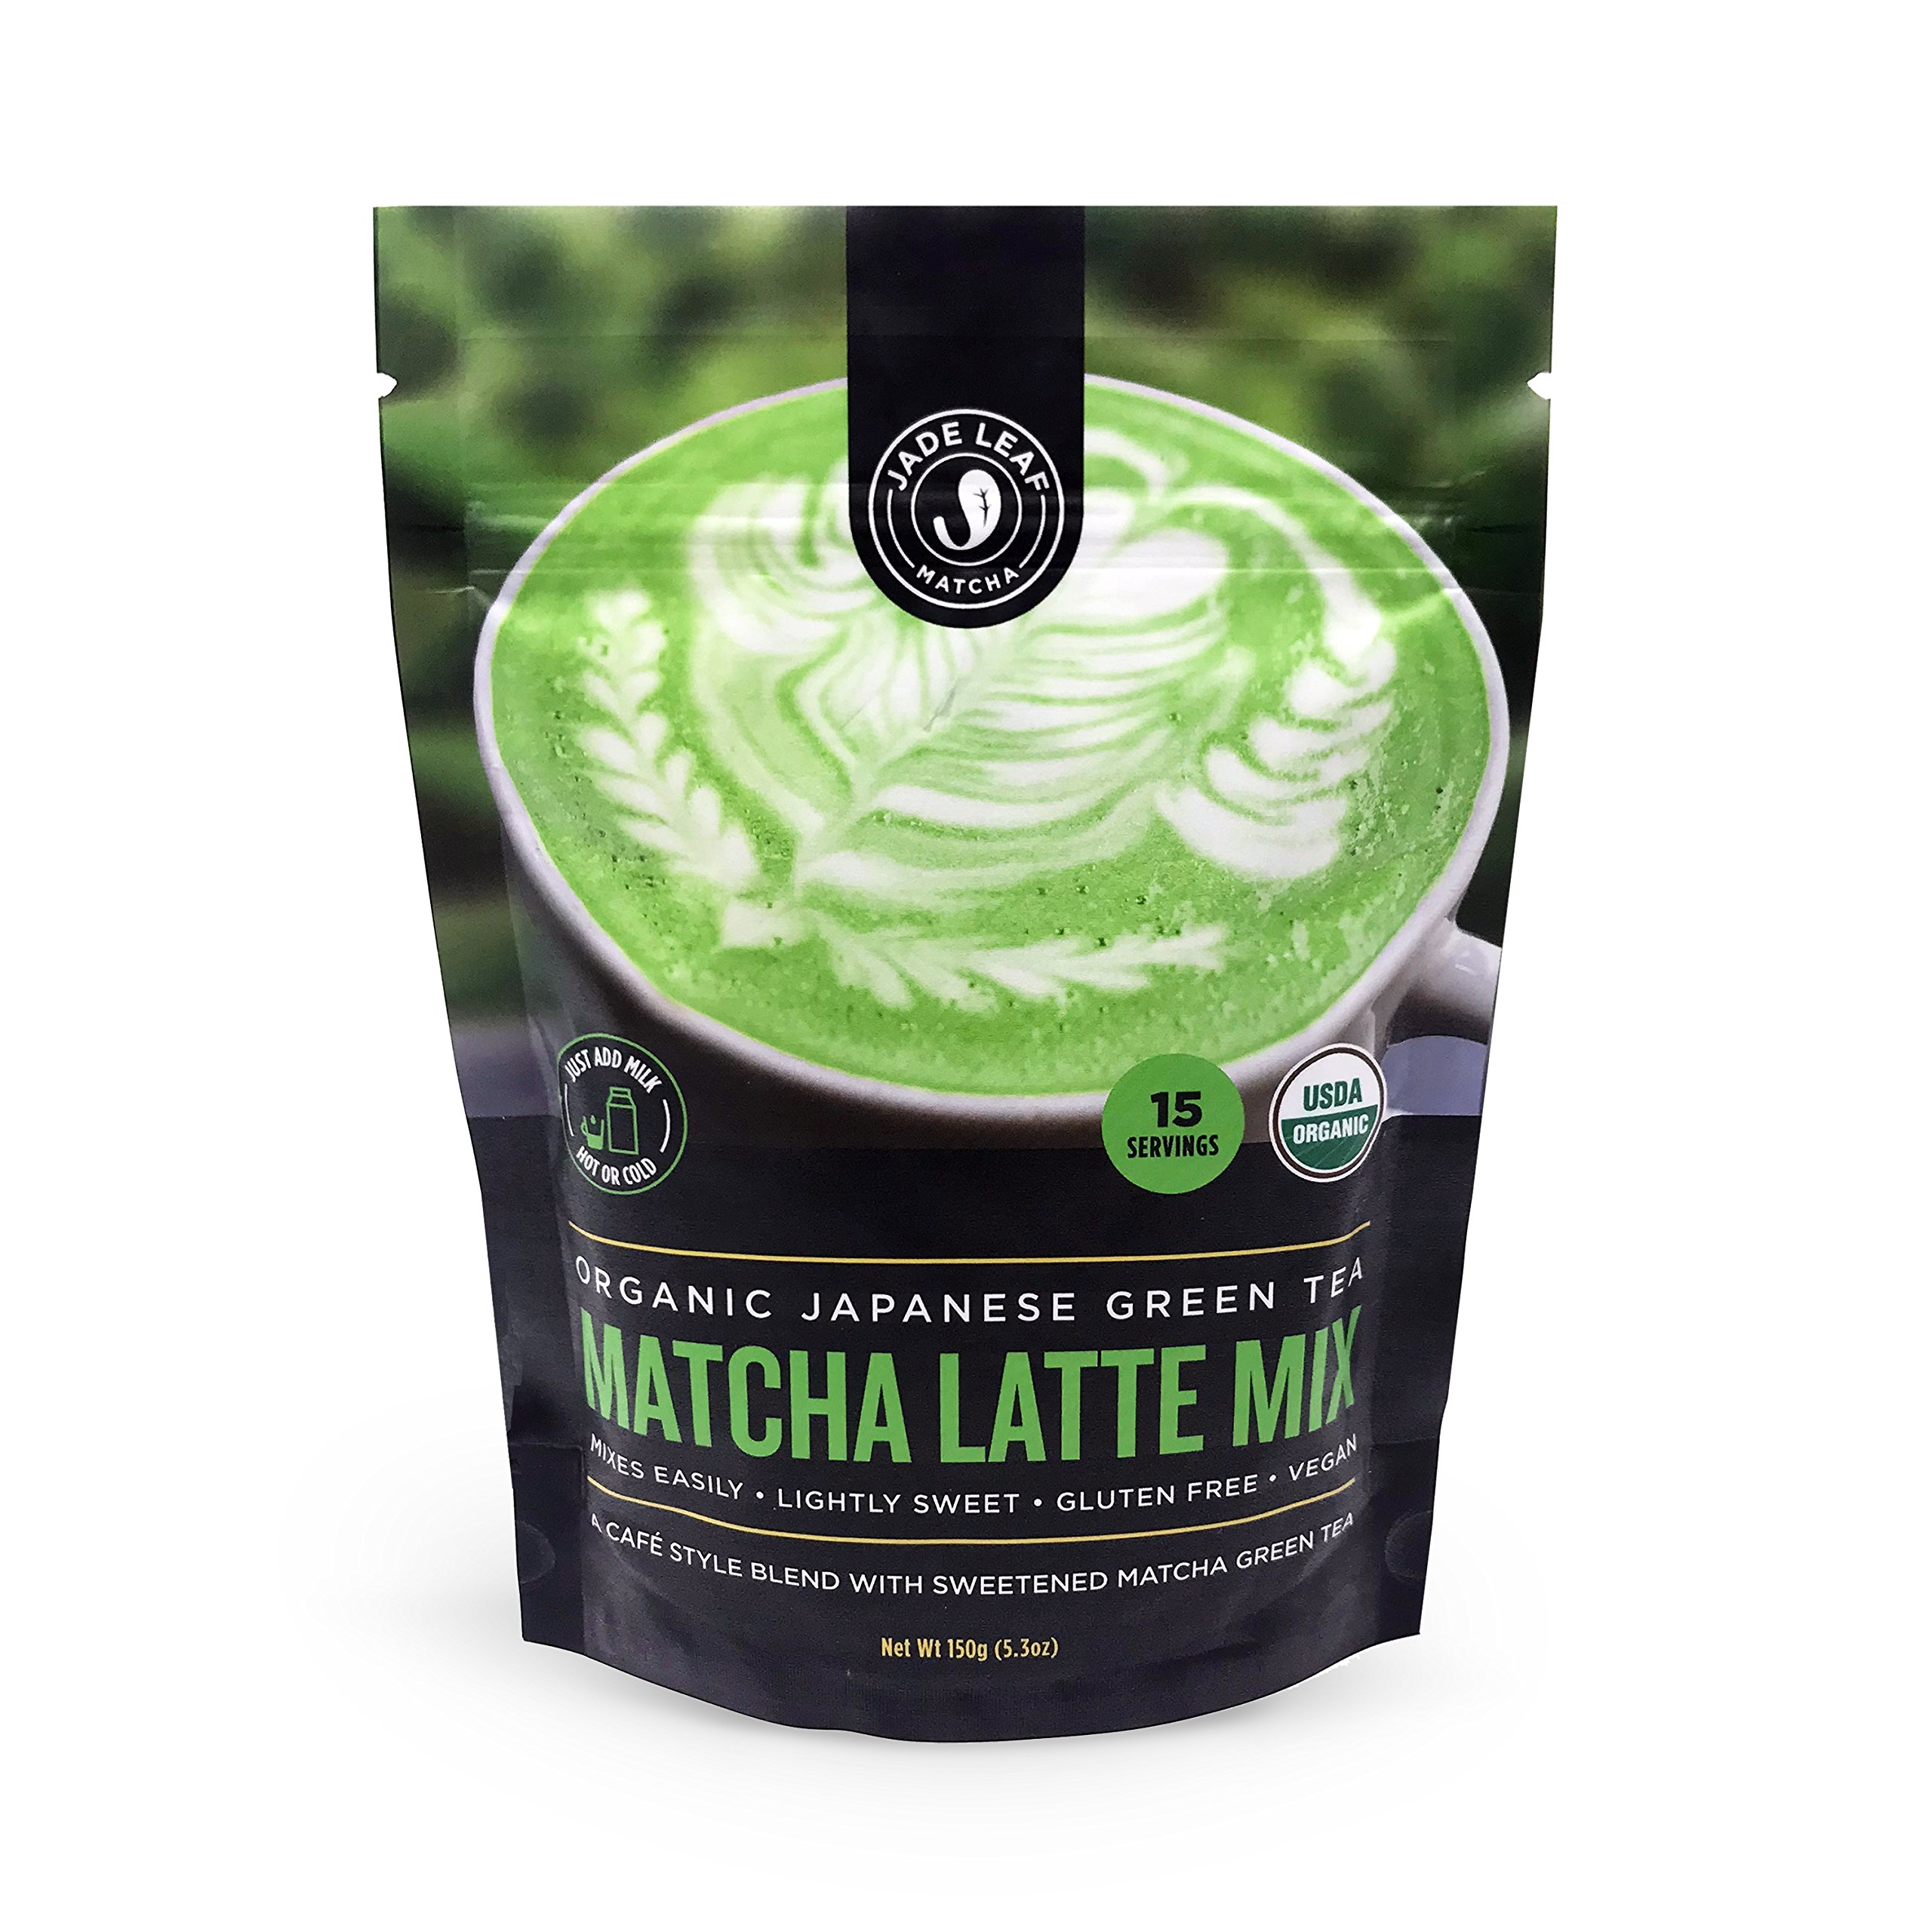 Jade Leaf - Organic Japanese Matcha Latte Mix - Make Delicious Matcha Green Tea Powder Lattes at Home [150g pouch]